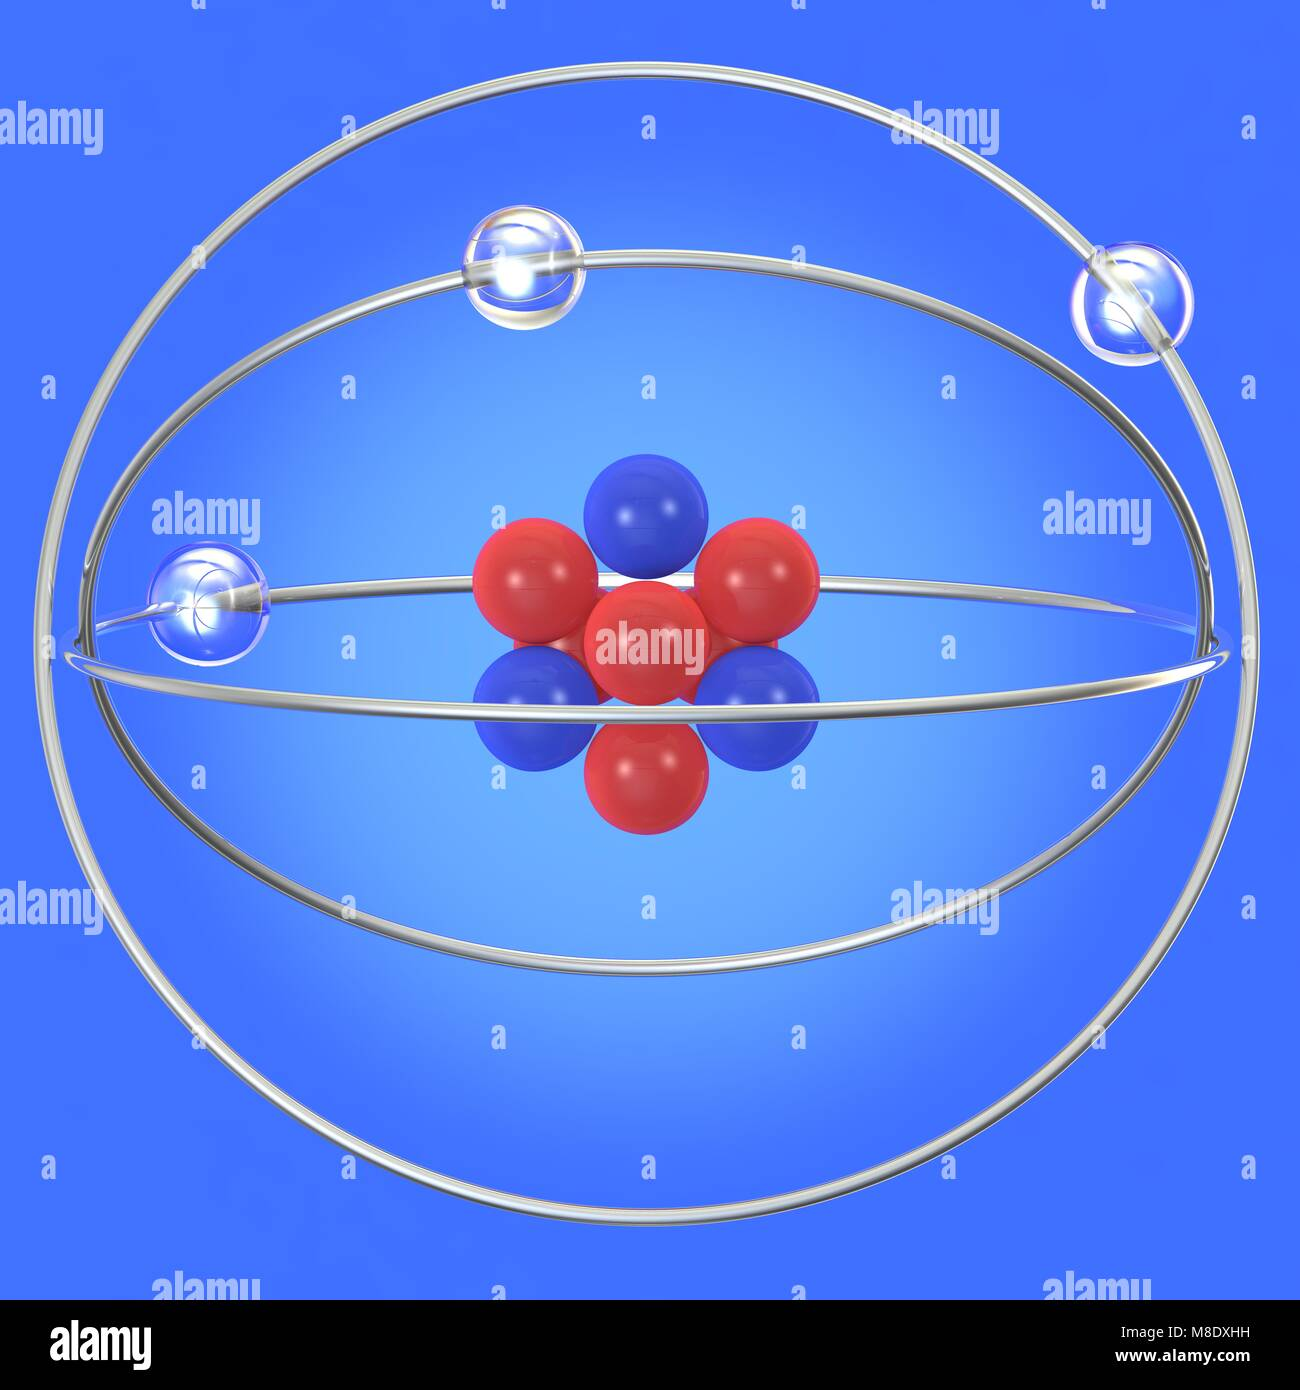 neon atom diagram nissan tiida radio wiring atomic structure stock photos and